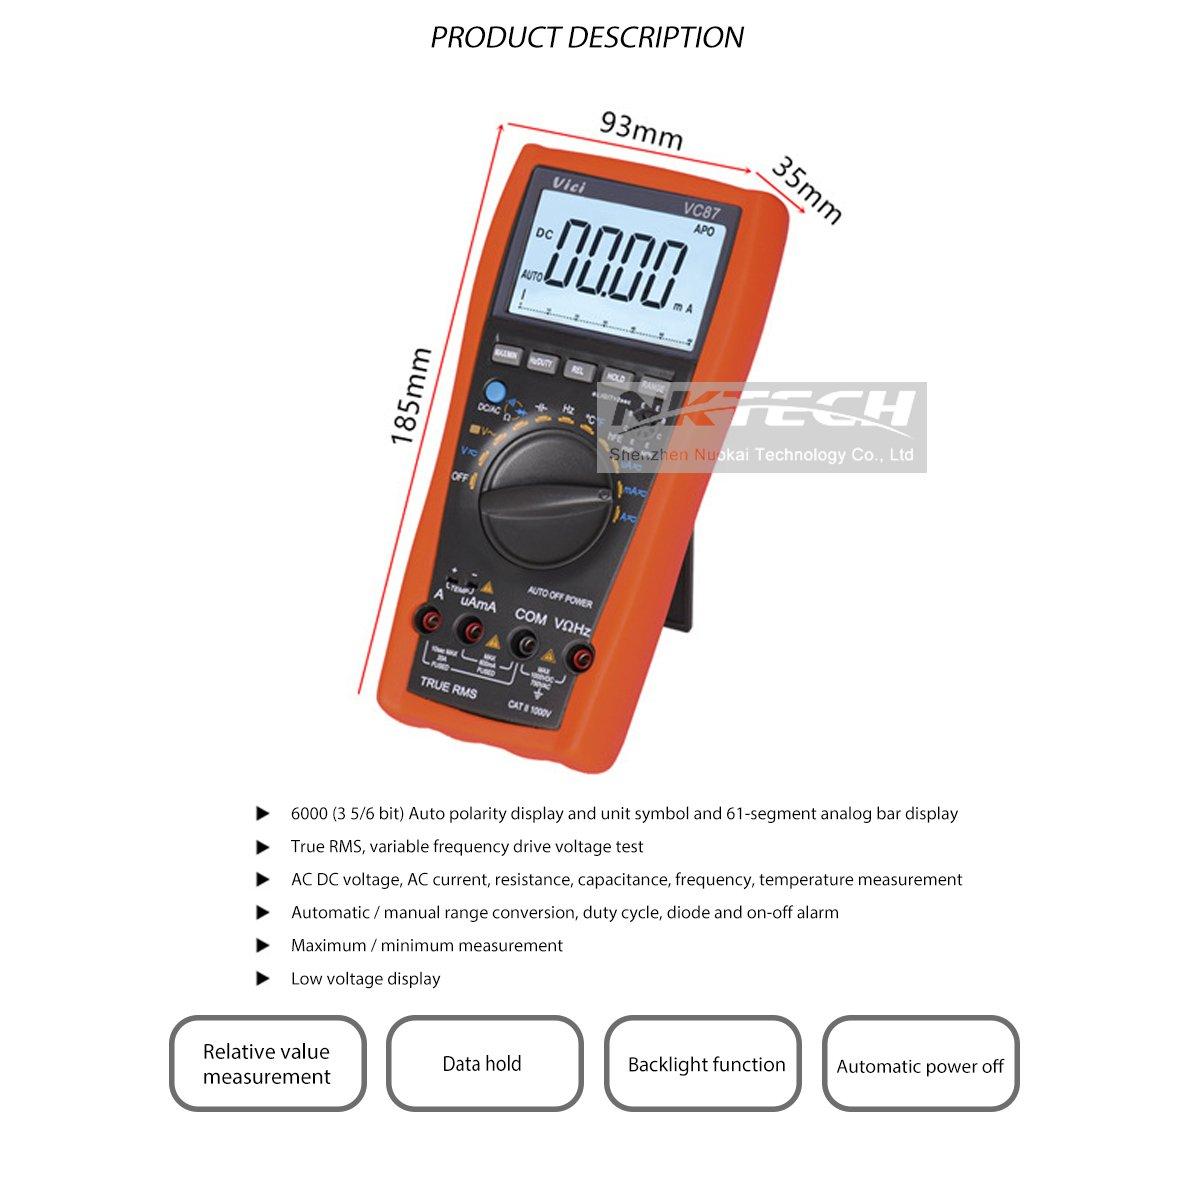 Digital Multimeter Sketch Ut54 Sch Service Manual Free Tester Circuit Page 4 Meter Counter Circuits Nextgr Download